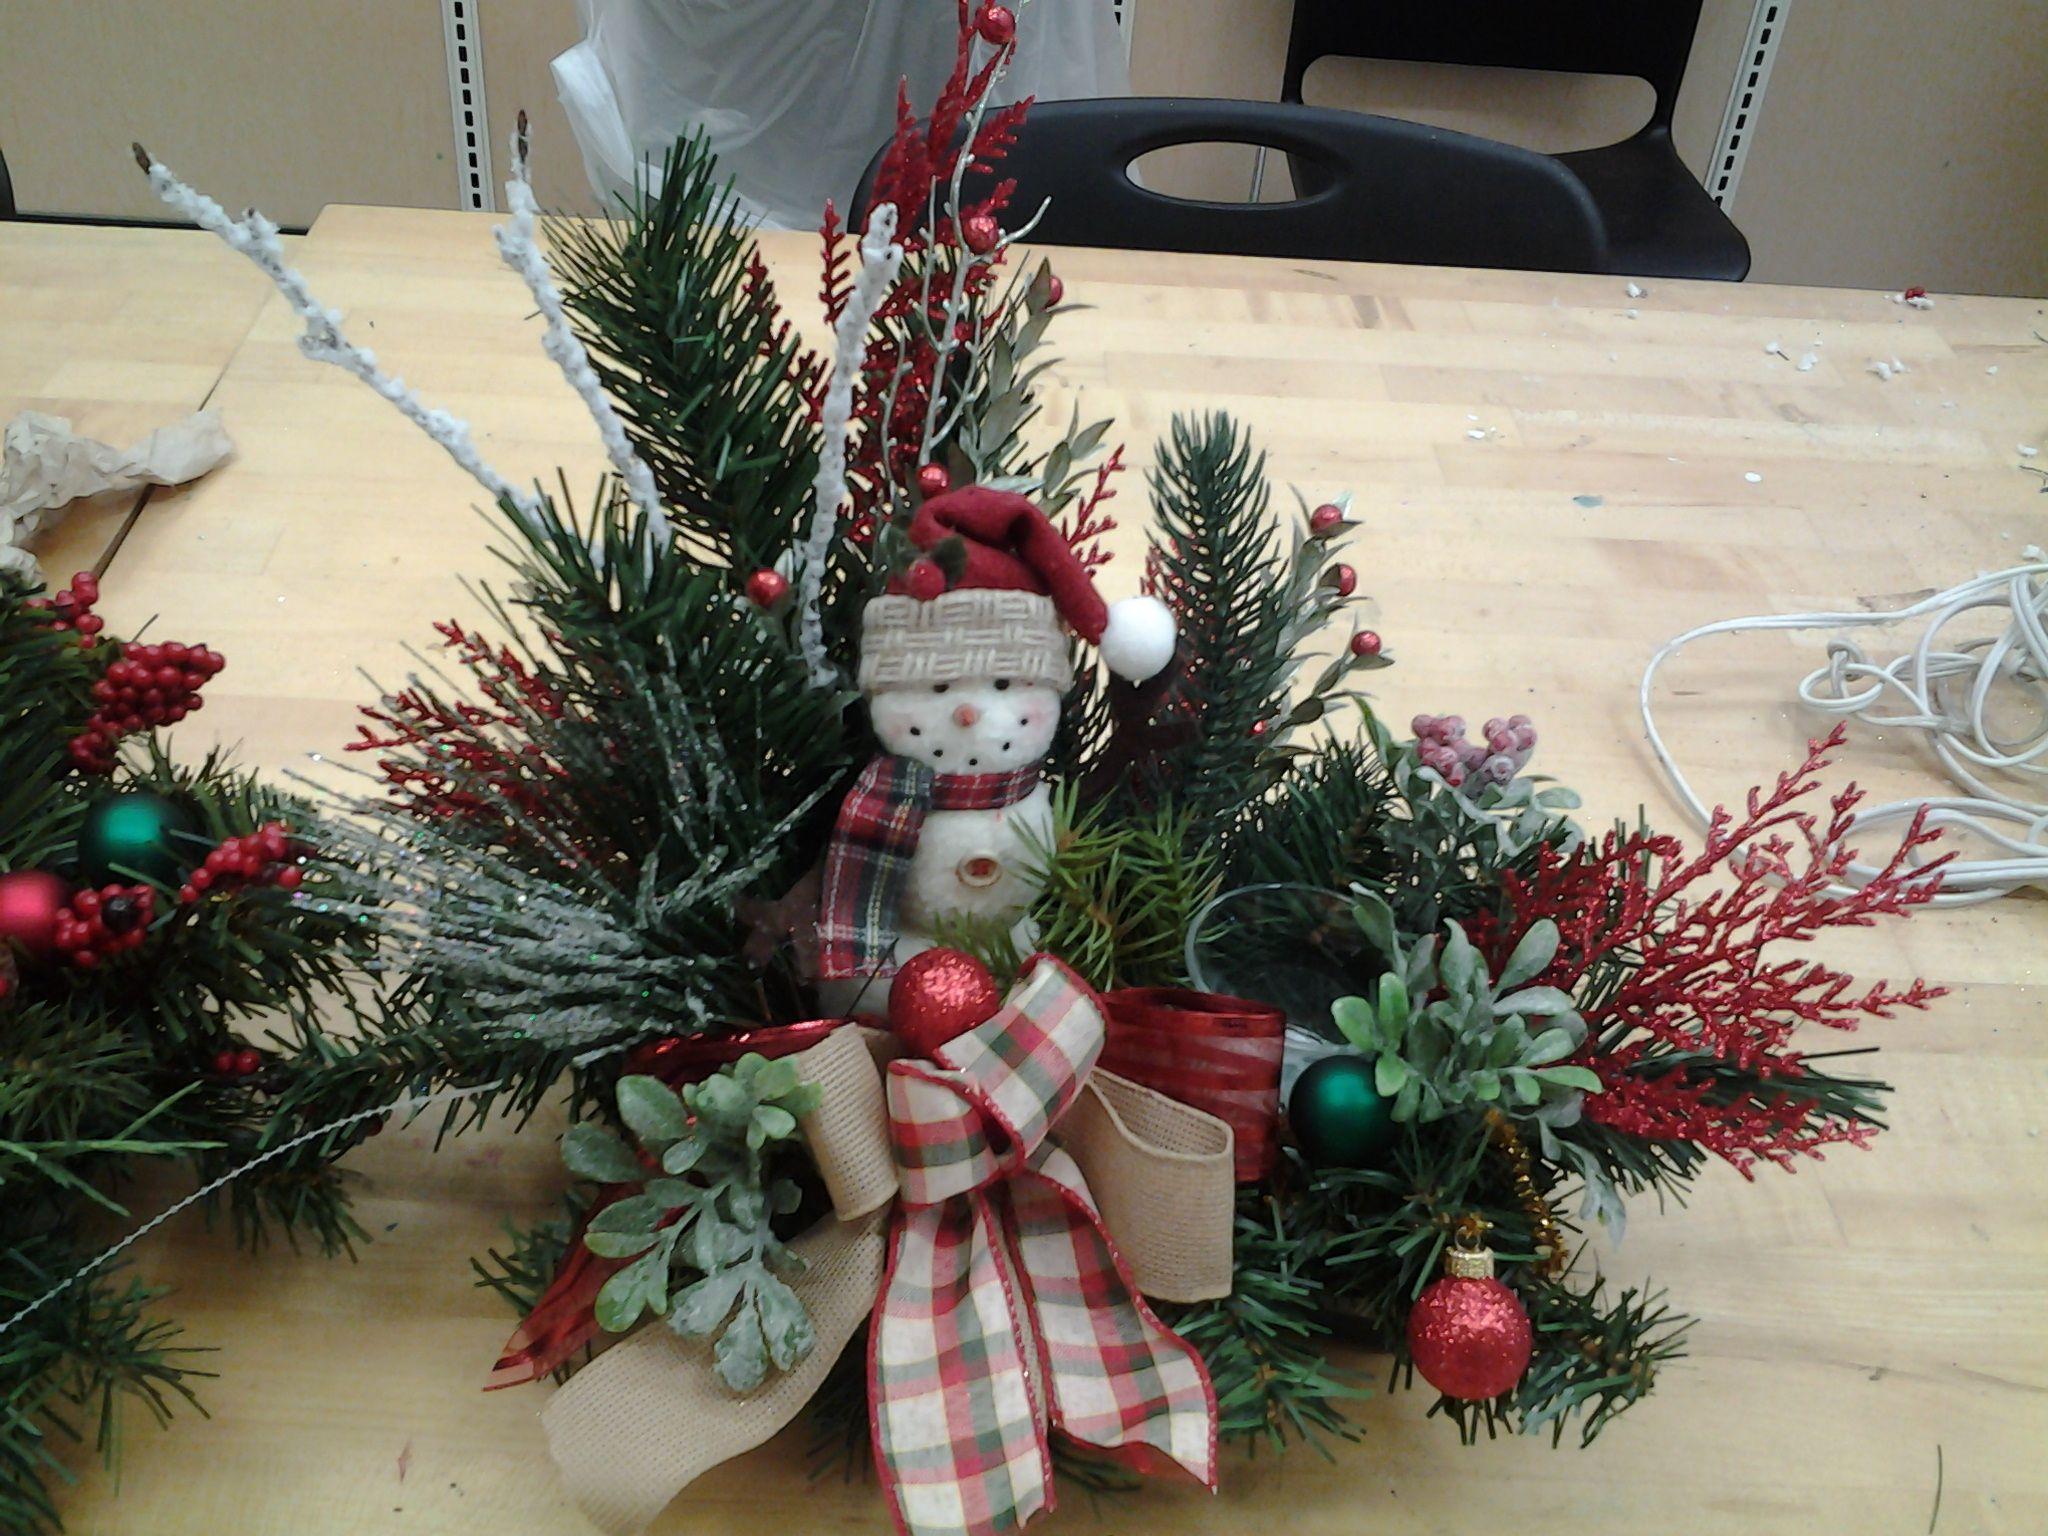 Snowman Tabletopcindy 2717 Christmas Floral Arrangementschristmas Centerpiecesfloral